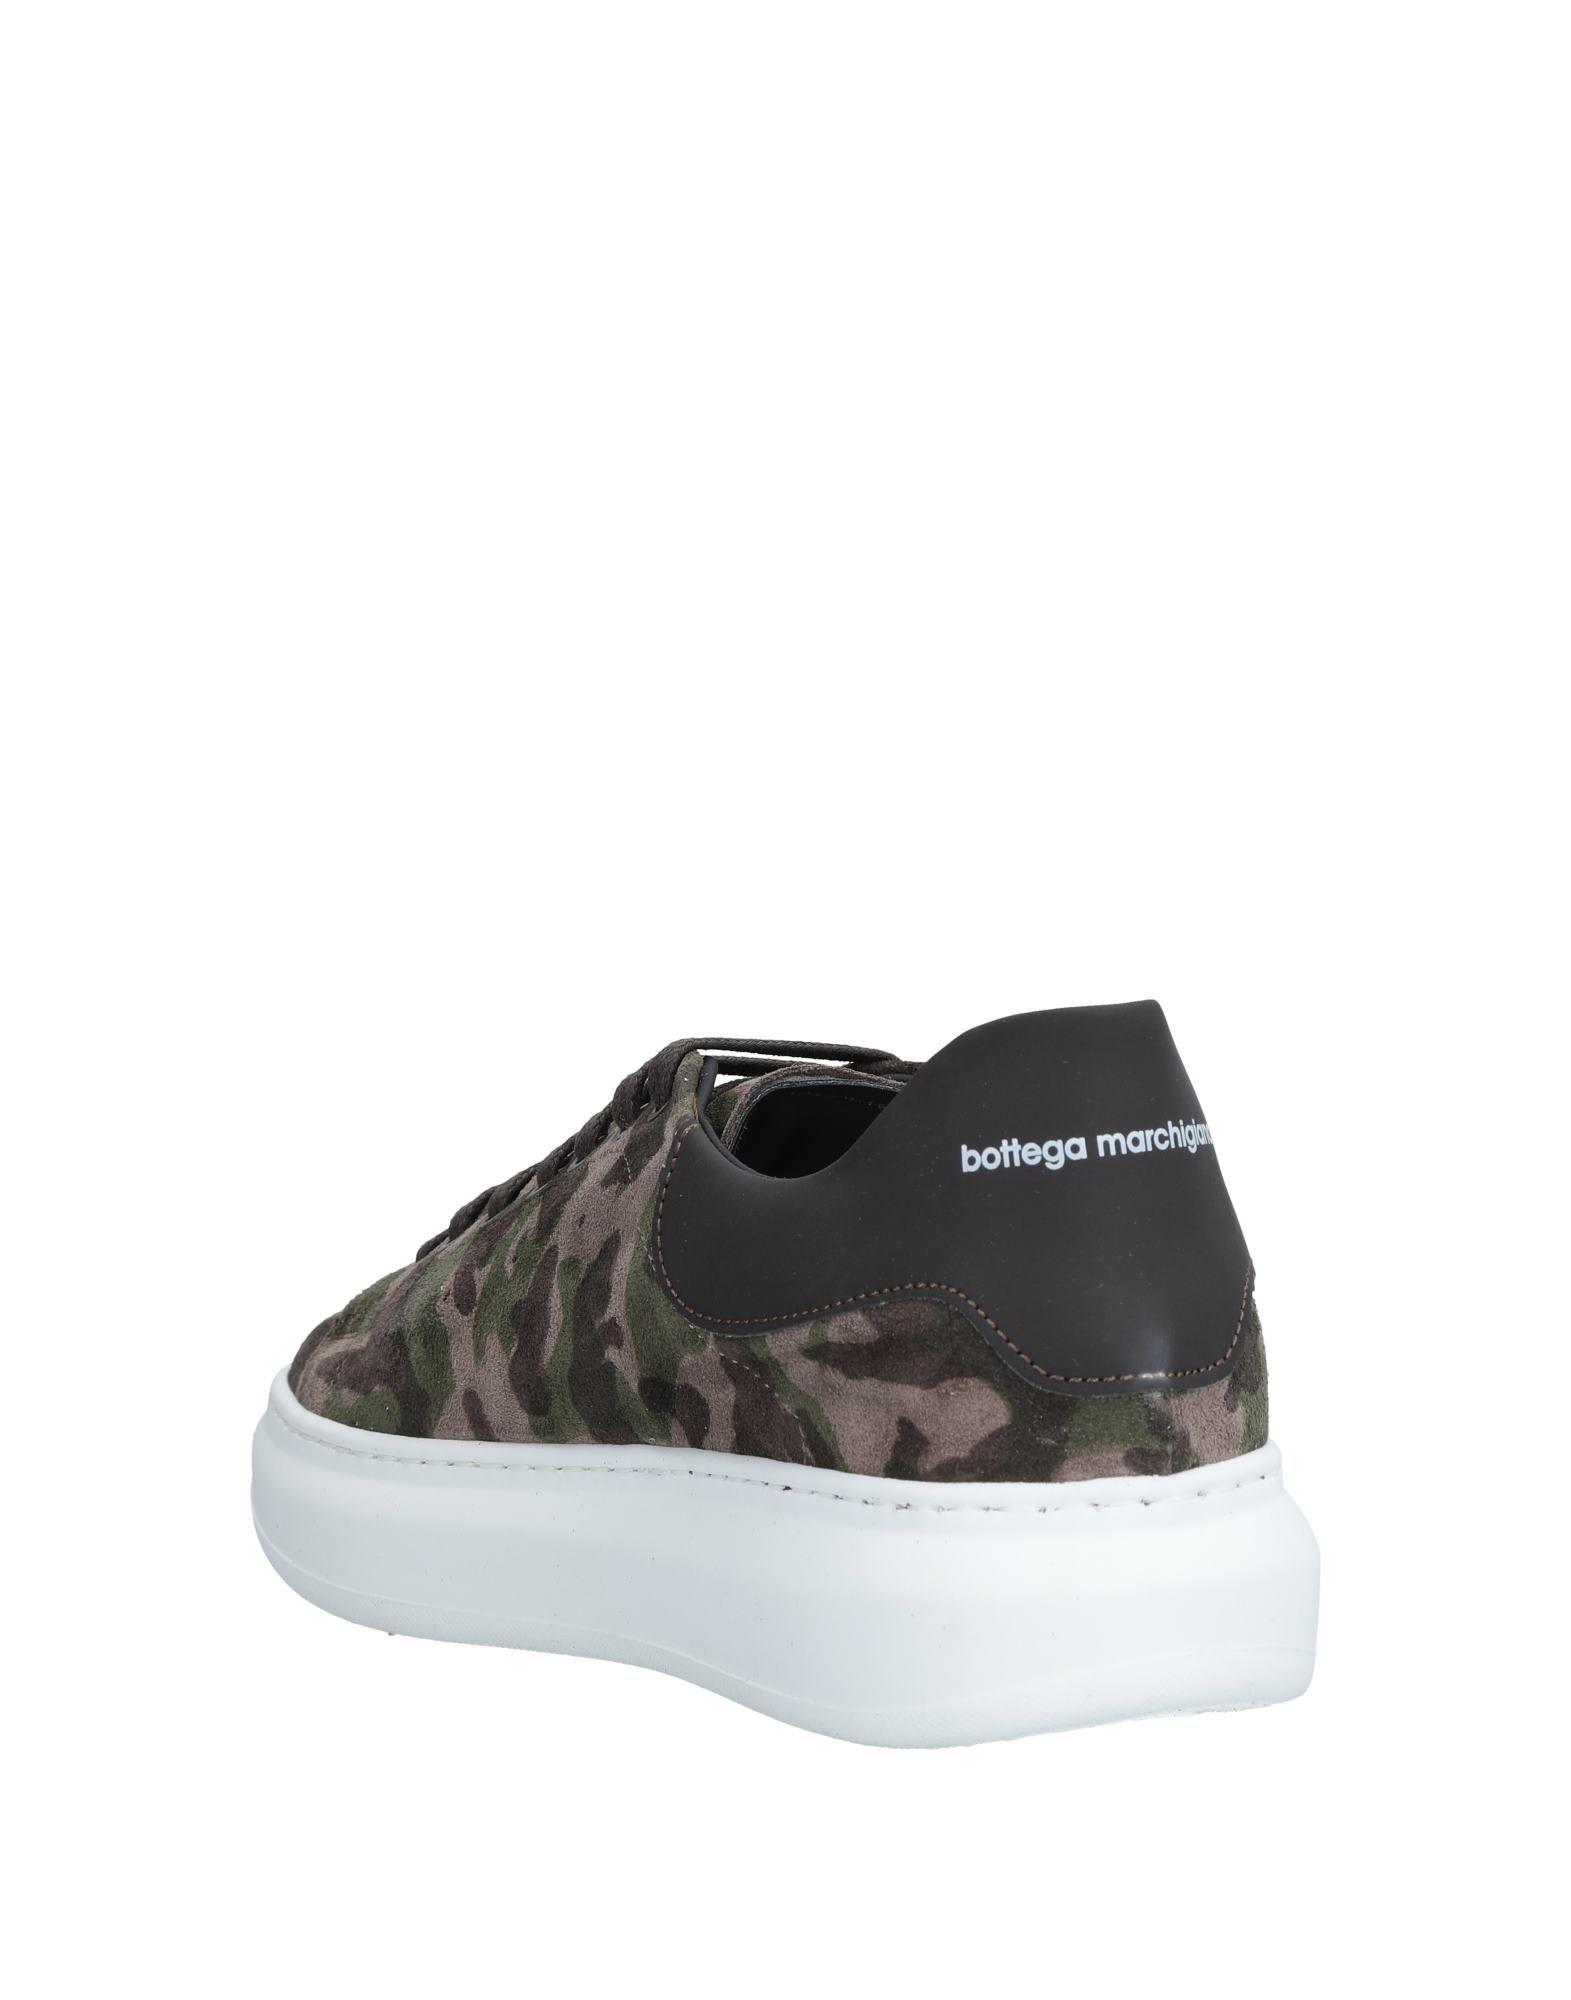 Sneakers - Bottega Marchigiana Uomo - Sneakers 11544440WP 303e3f